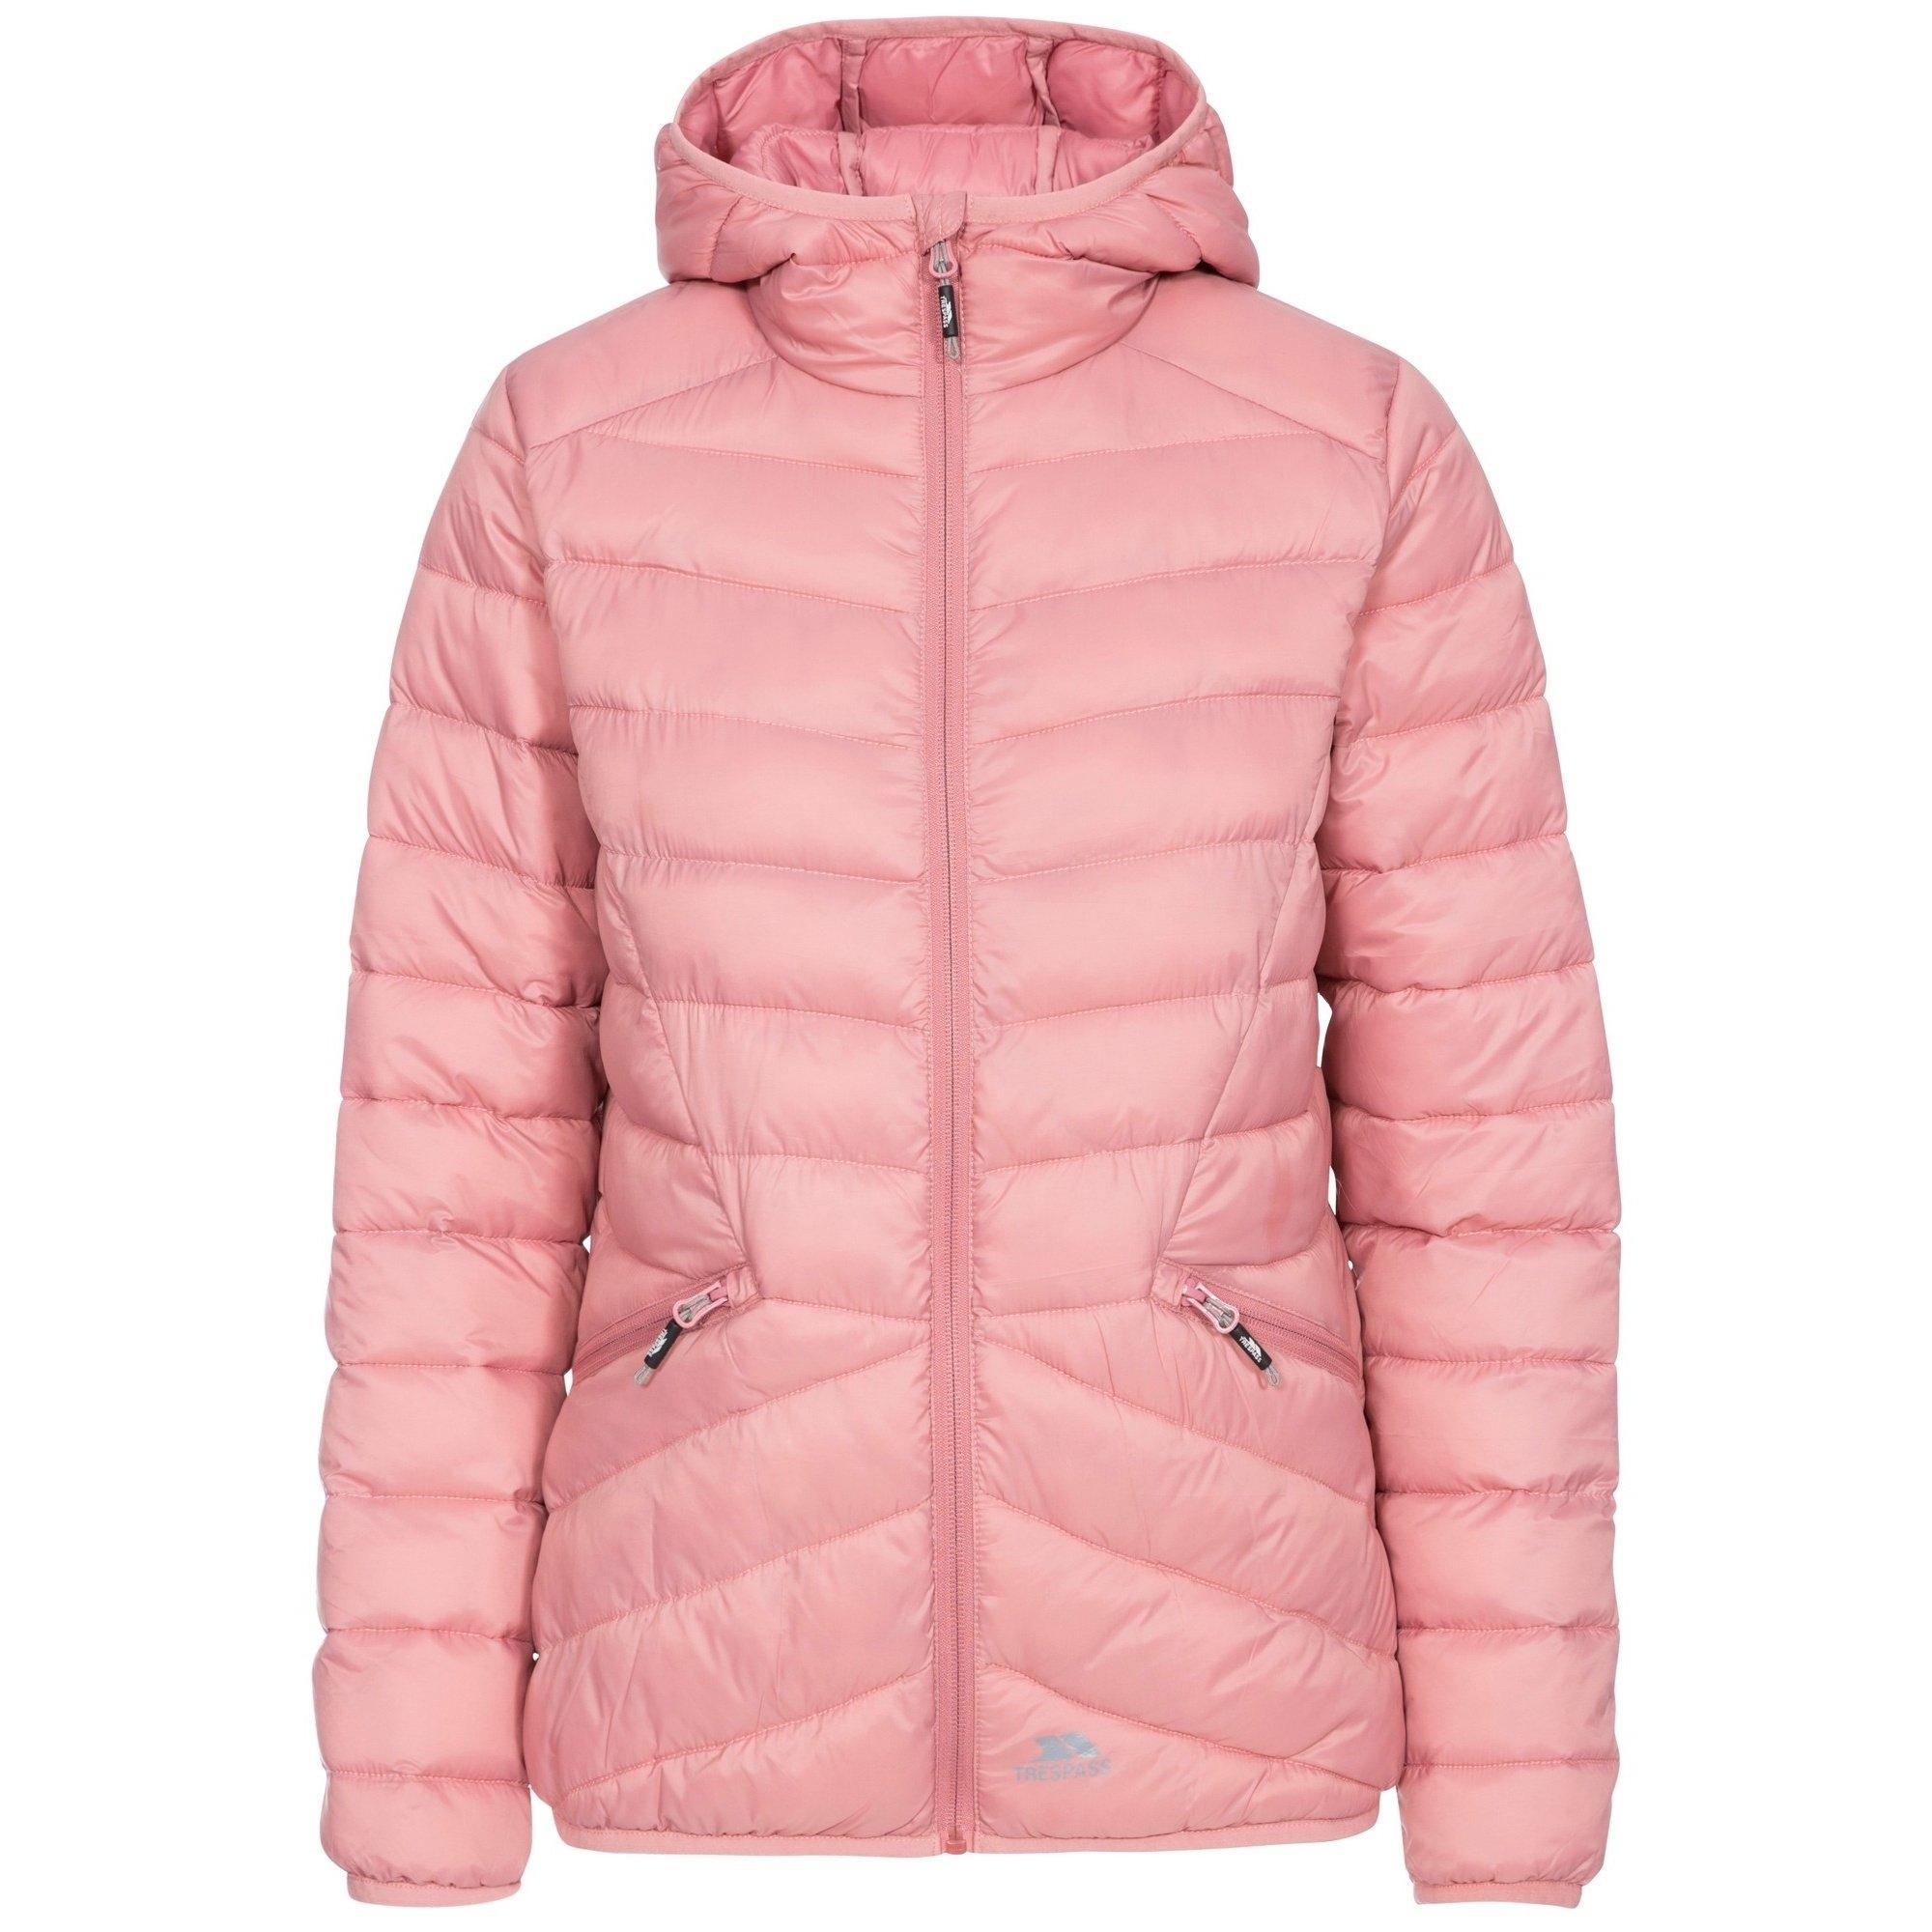 Trespass gewatteerde jas »Damen Alyssa« - verschillende betaalmethodes